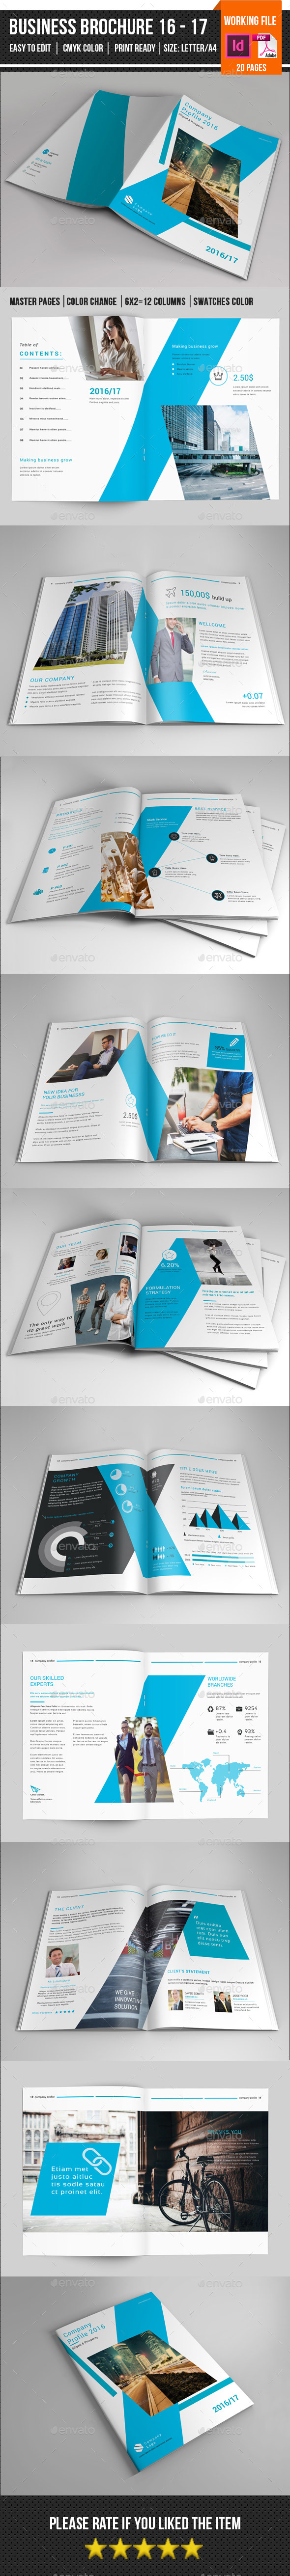 Business Brochure Template-V407 - Corporate Brochures